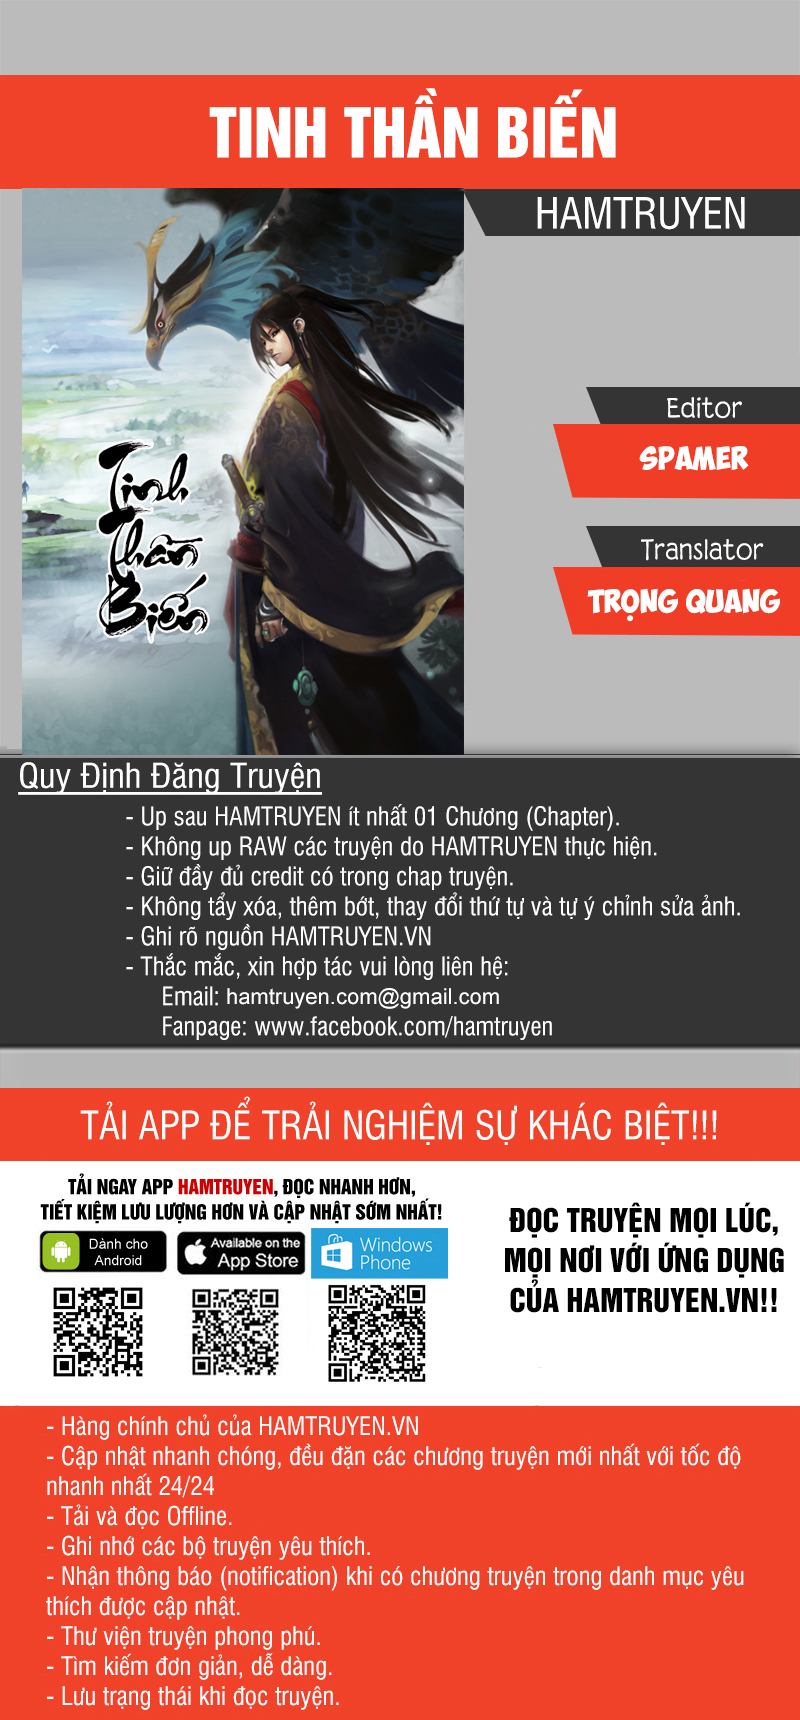 Tinh Thần Biến Chap 104 - Truyen.Chap.VN